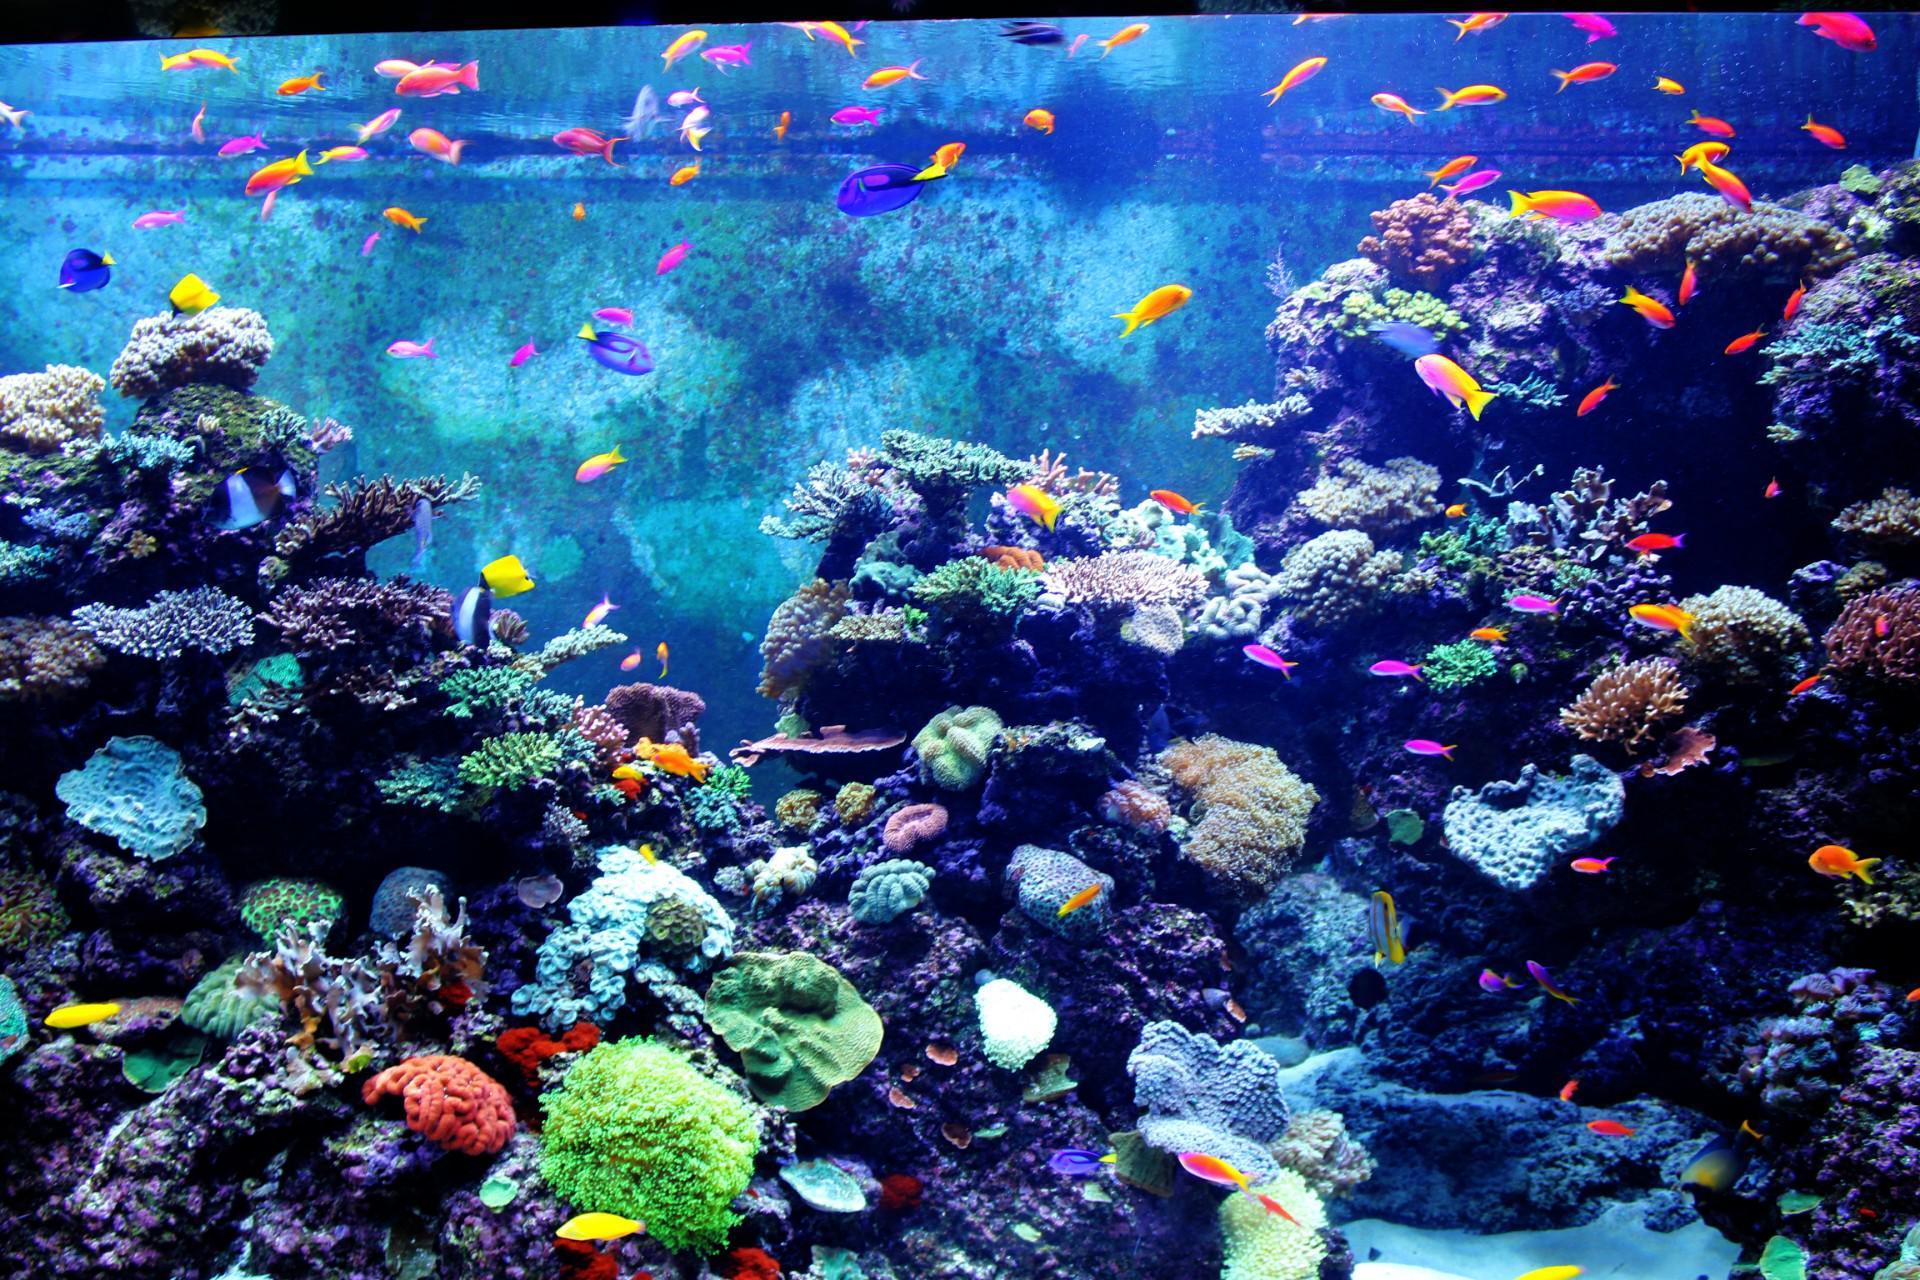 Aquarium Wallpaper Free Download 1920x1280 Download Hd Wallpaper Wallpapertip